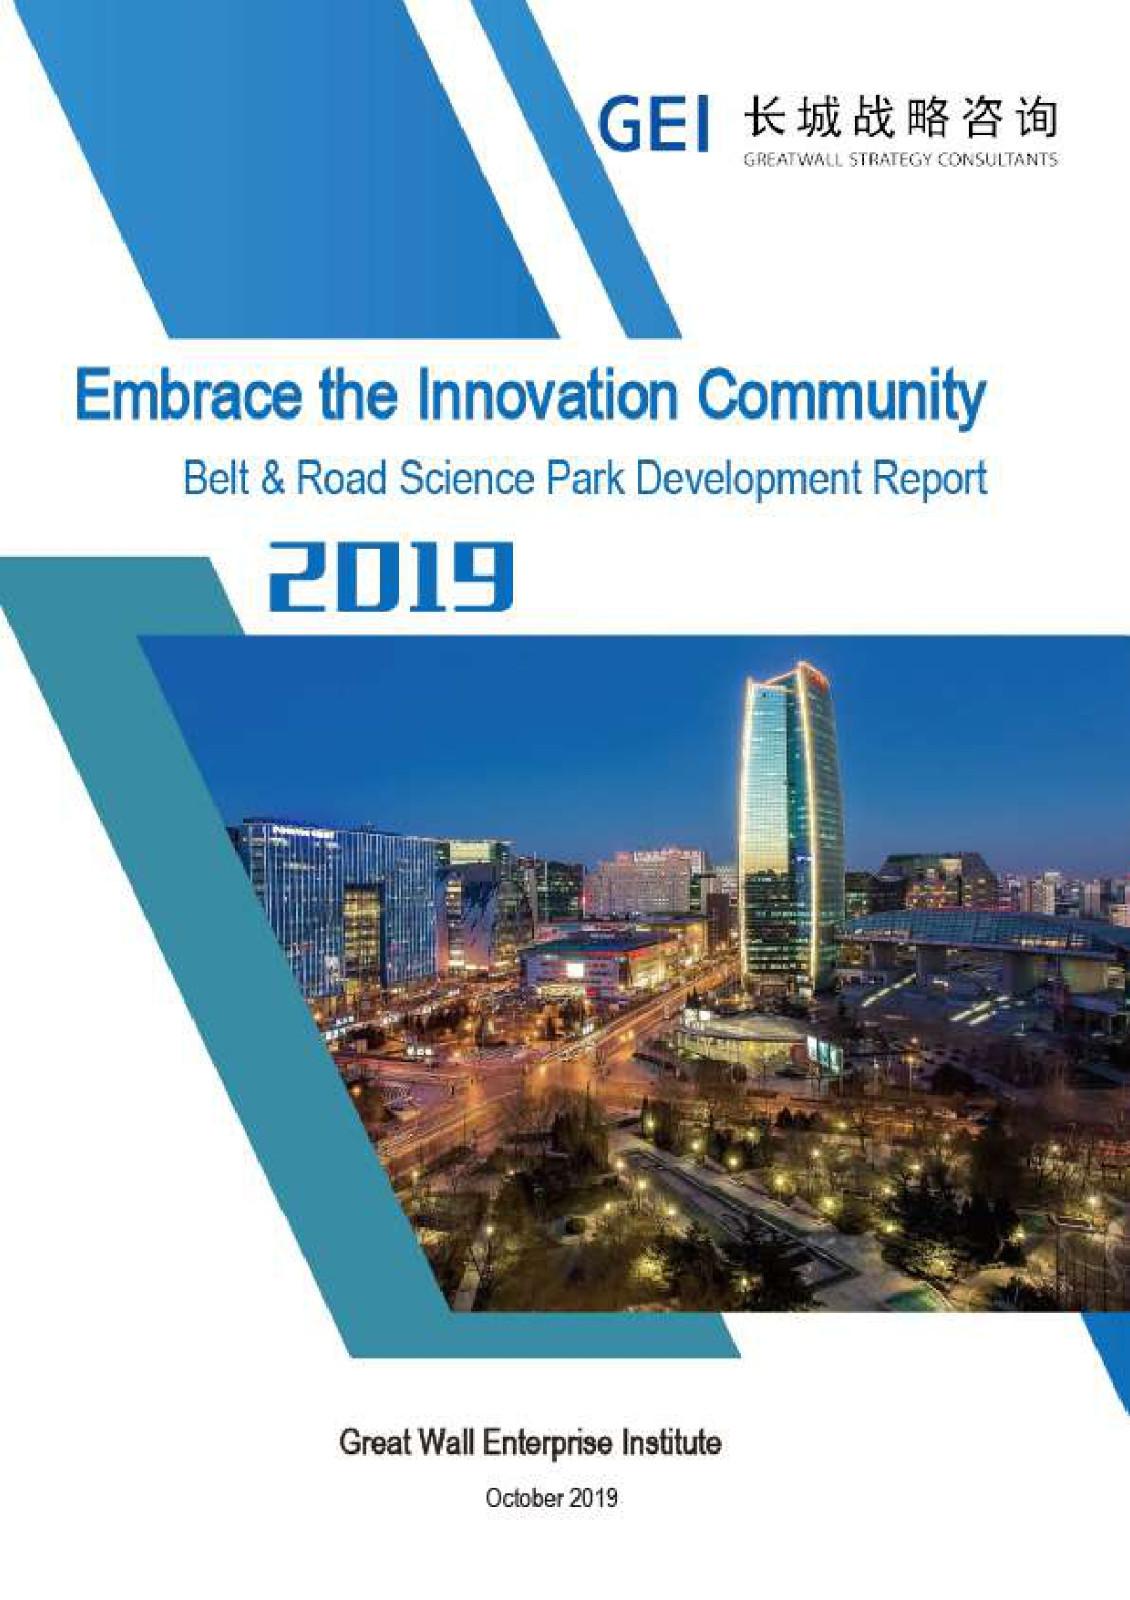 GEI-B&R Science Park Development Report 2019_page-0001.jpg